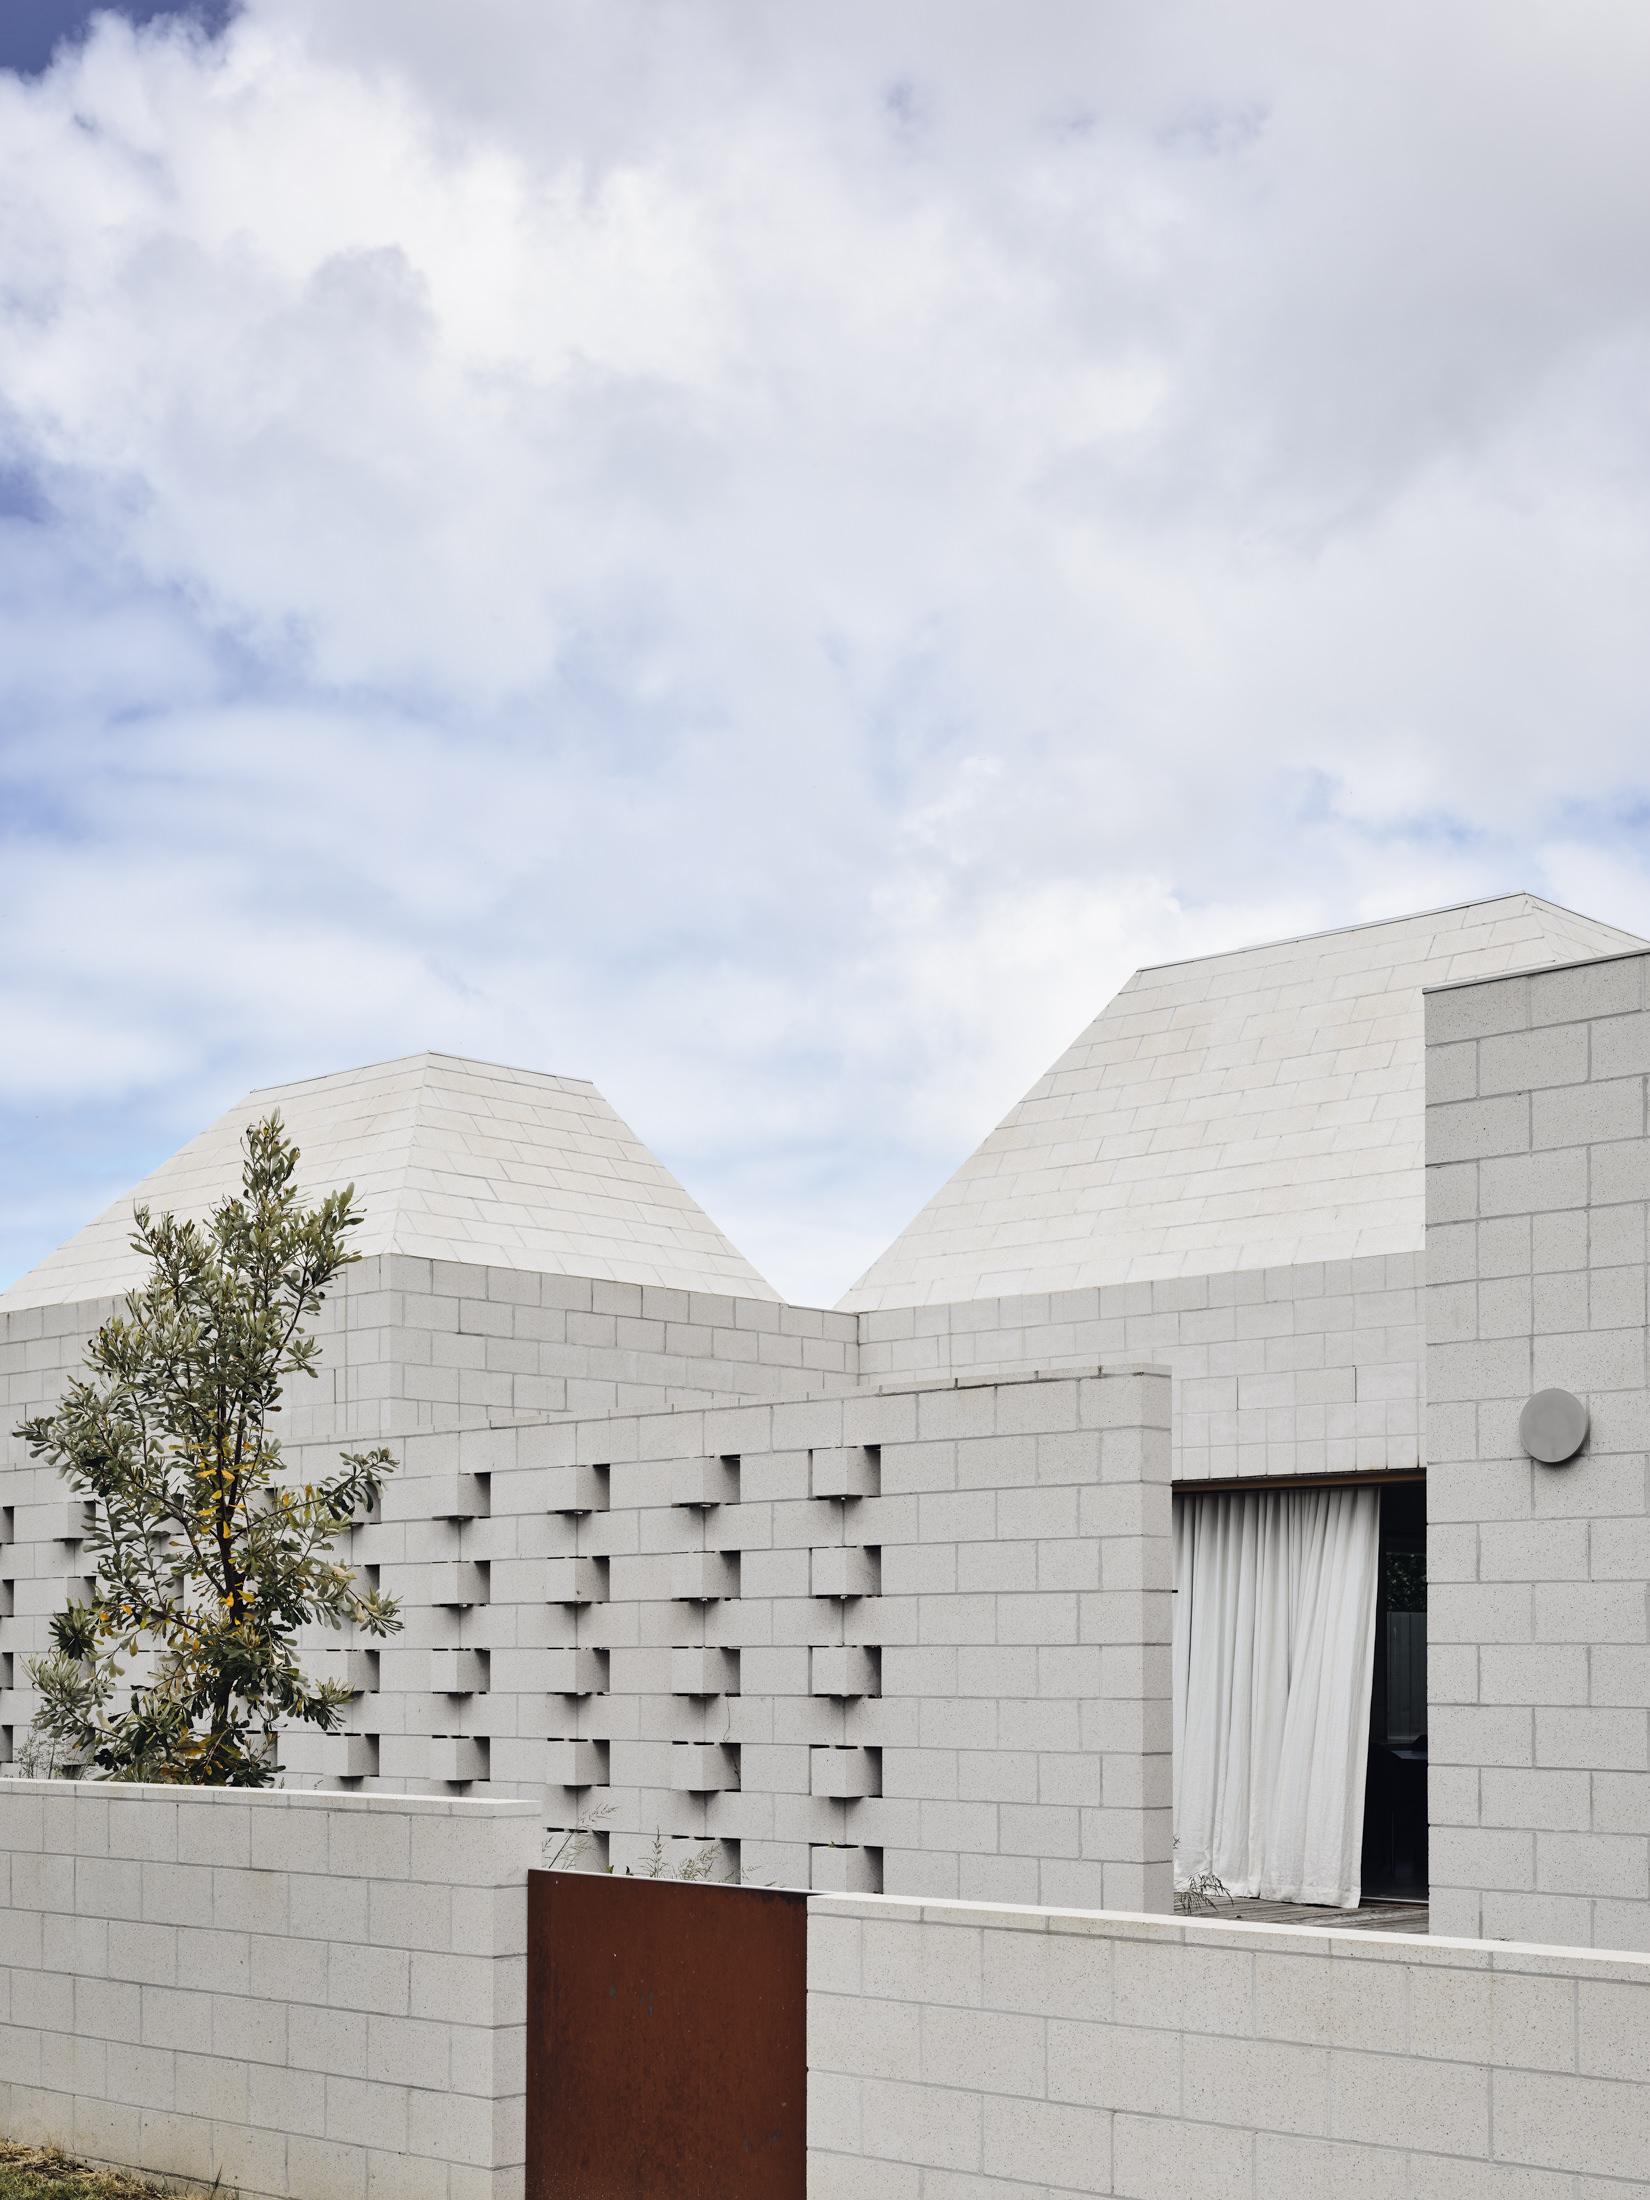 Architects Eat Bellows Beach House Flinders Masonry Architecture Photo Derek Swalwell Yellowtrace 04